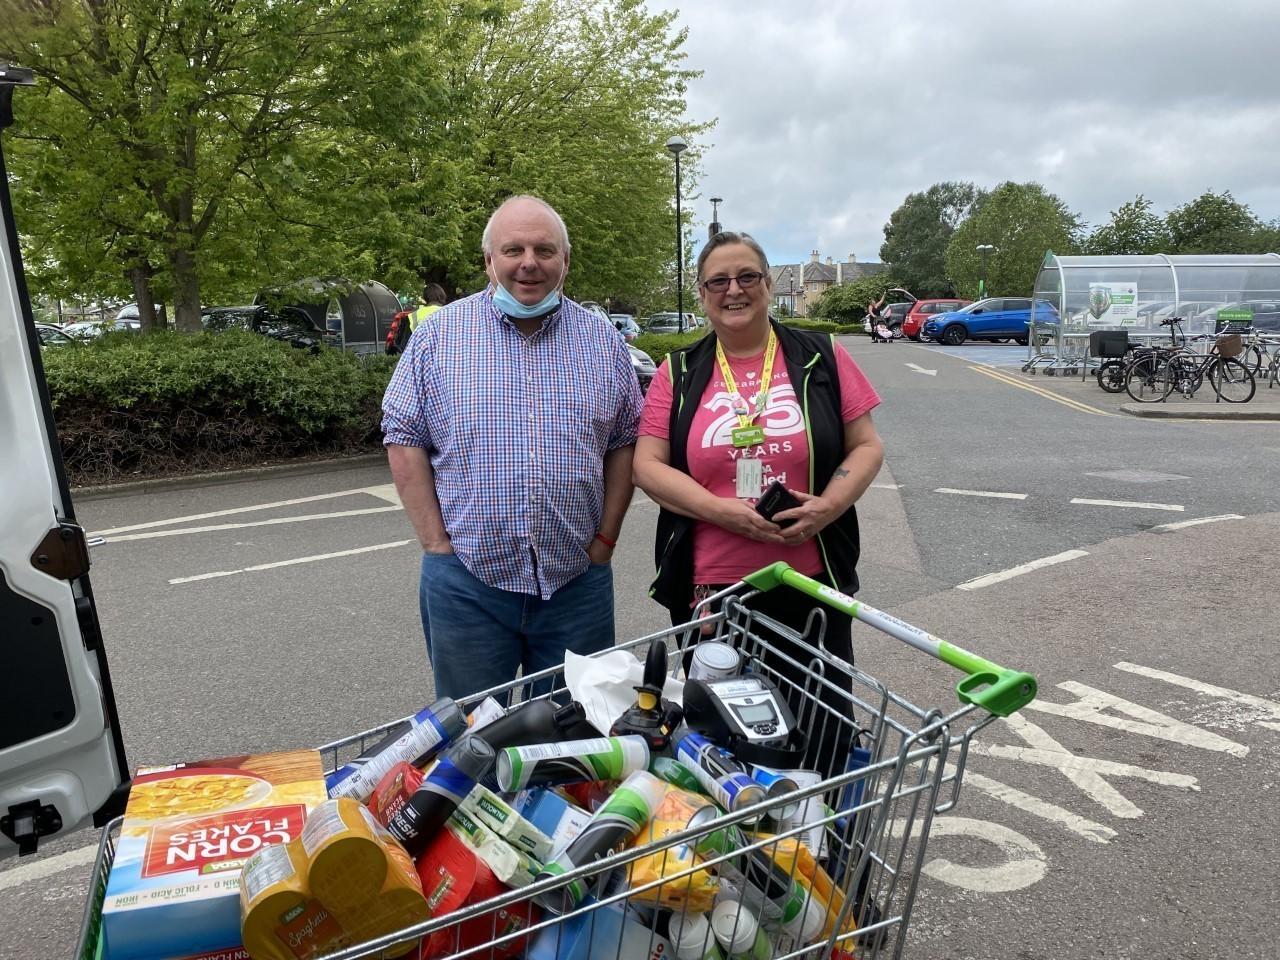 Jimmy's Night Shelter donation | Asda Cambridge